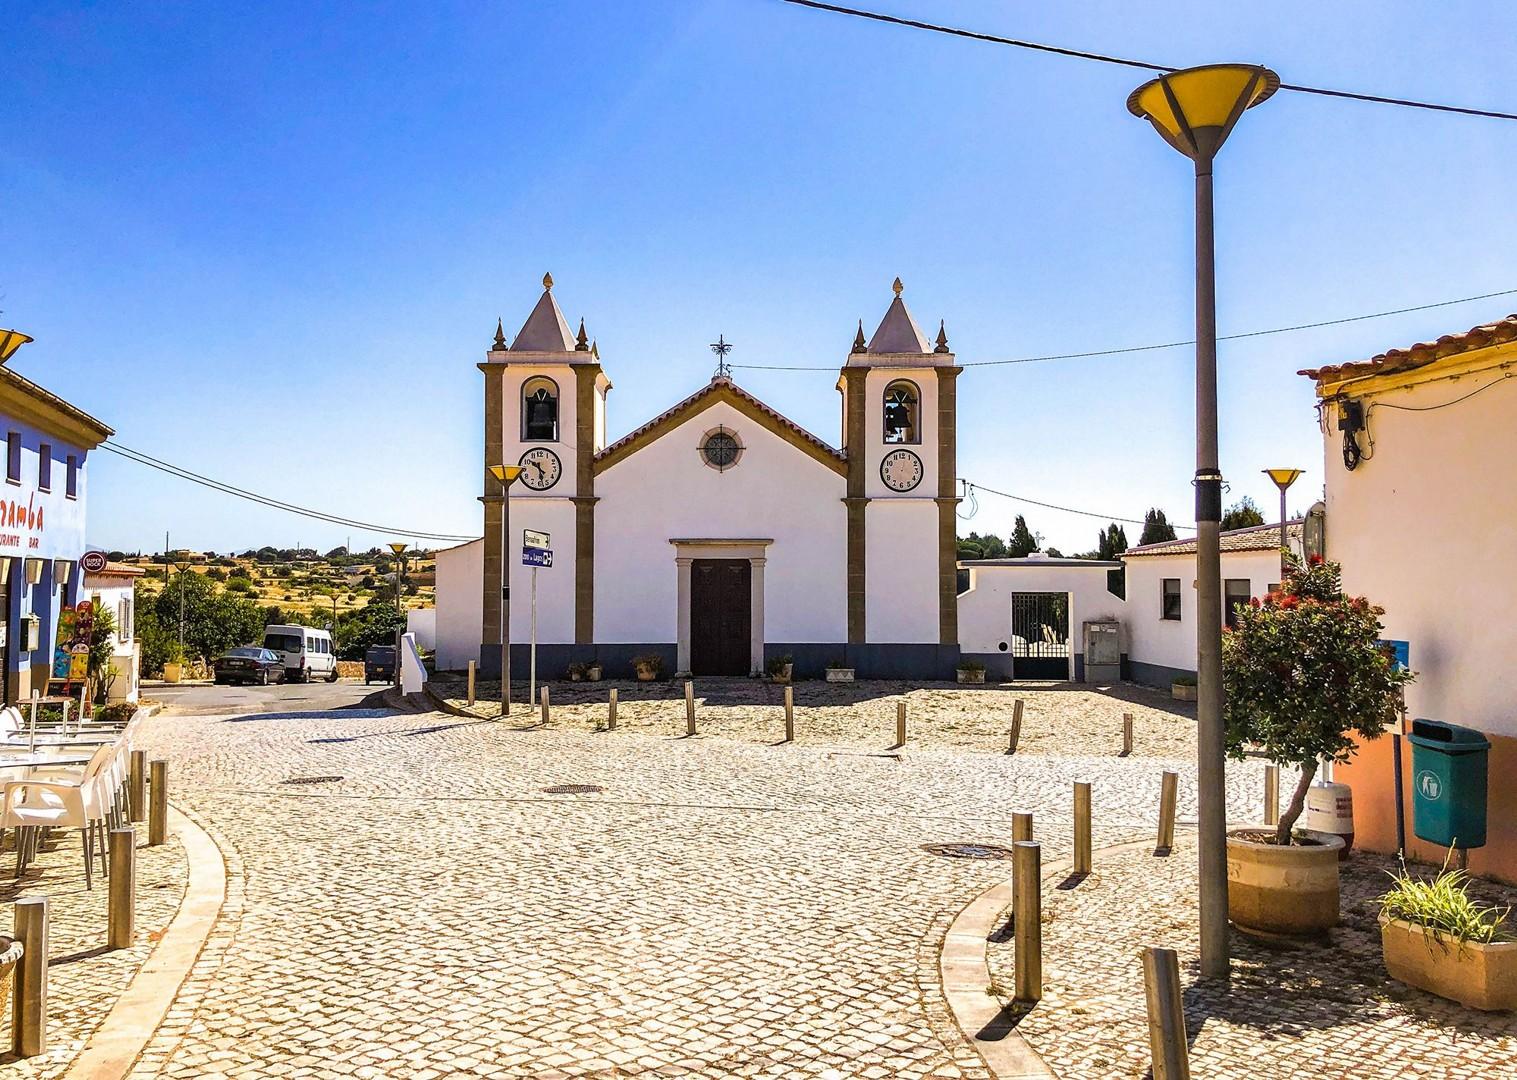 portugal-culture-leisure-holiday-self-guided-trip-saddle-skedaddle.jpg - Portugal - Alentejo and Algarve Coastal Explorer - Self-Guided Leisure Cycling Holiday - Leisure Cycling